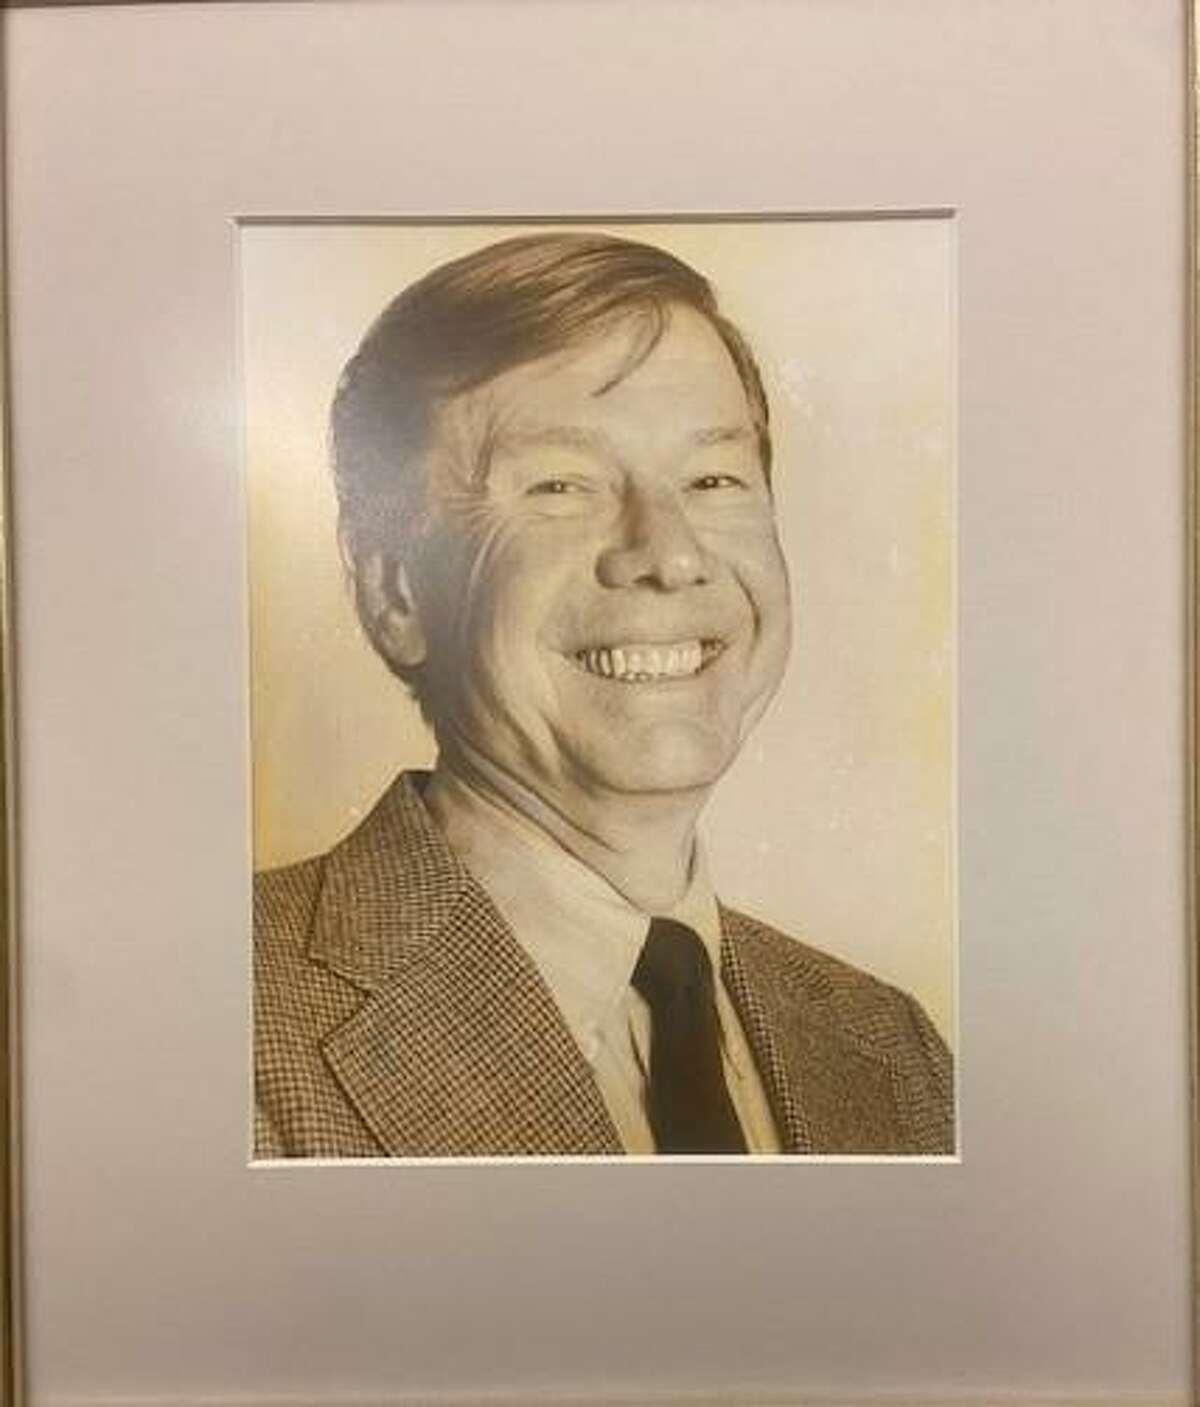 Former Westport First Selectman John Kemish, who died April 25, 2021 at age 93.